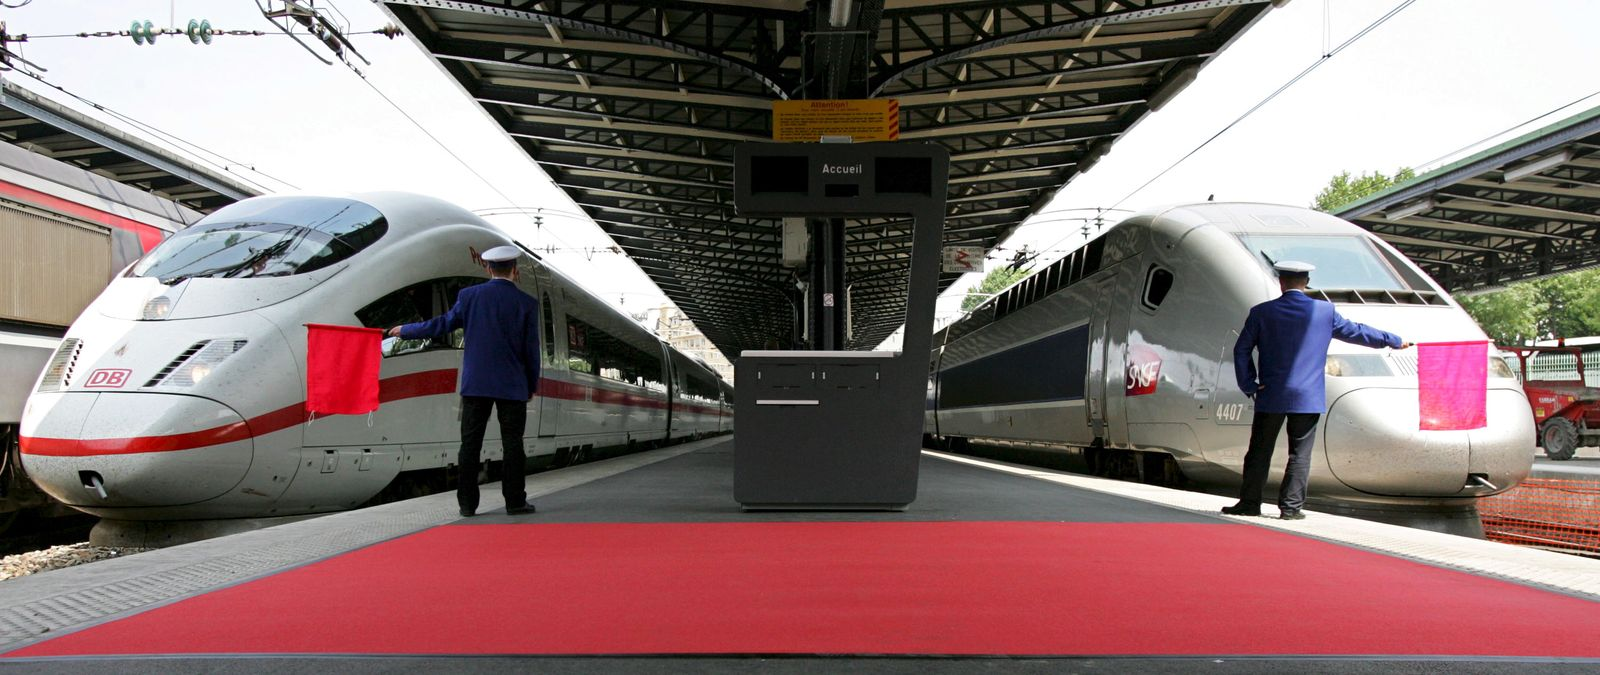 Siemens Alstom Fusion / EU-Kommission / ICE und TGV